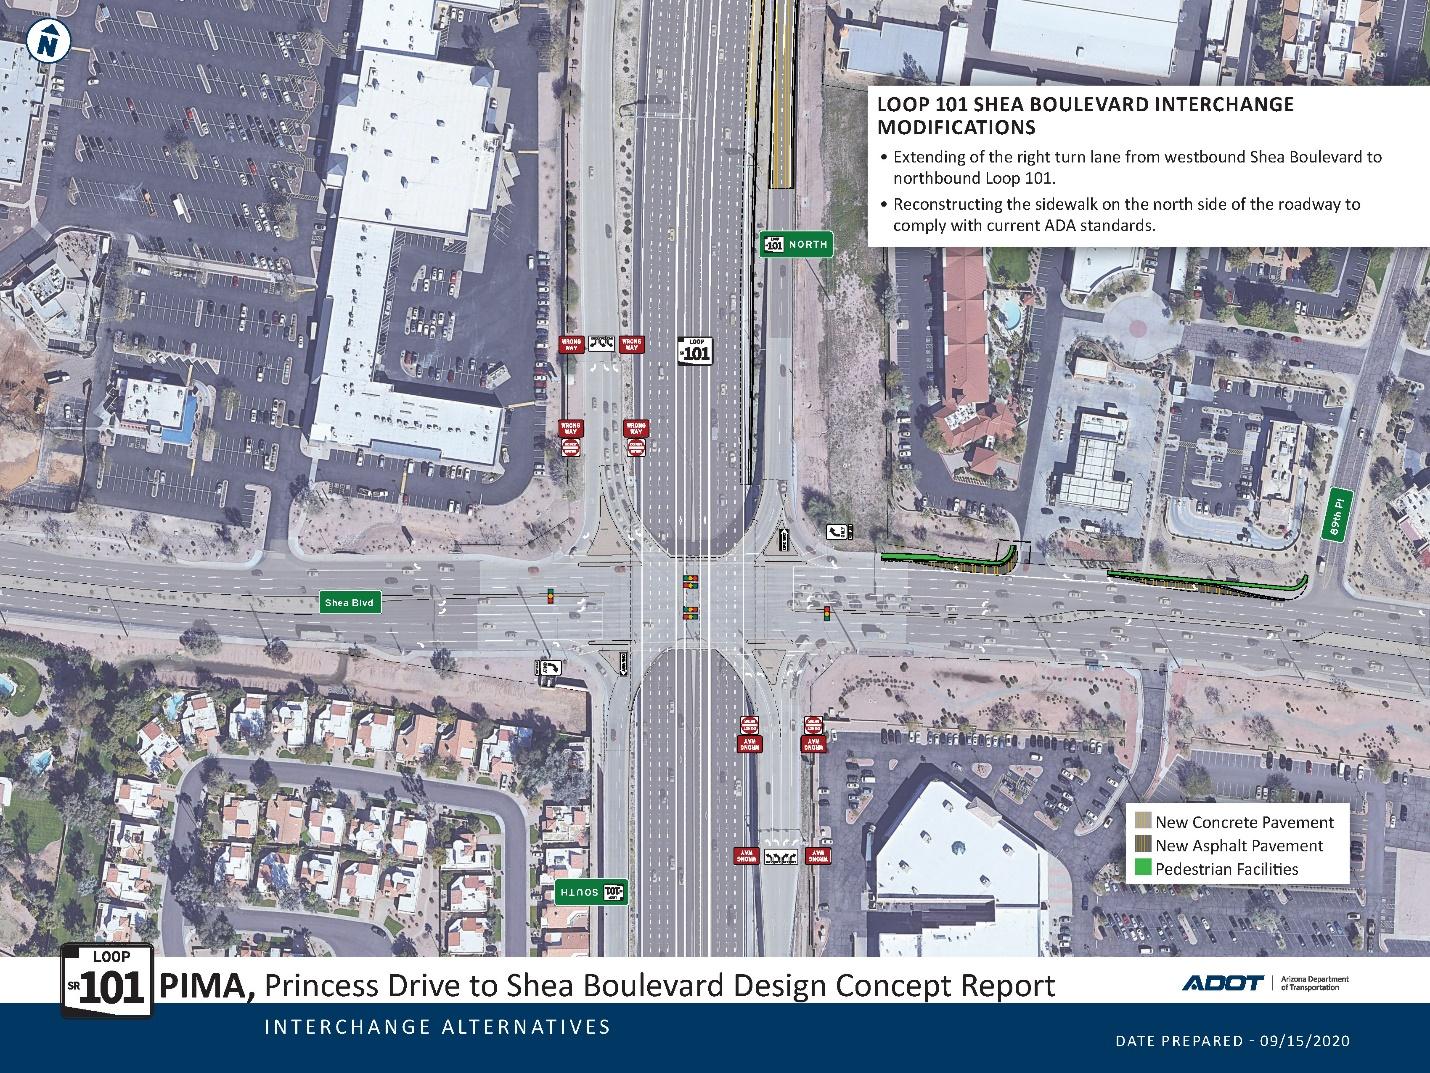 Shea Boulevard Interchange